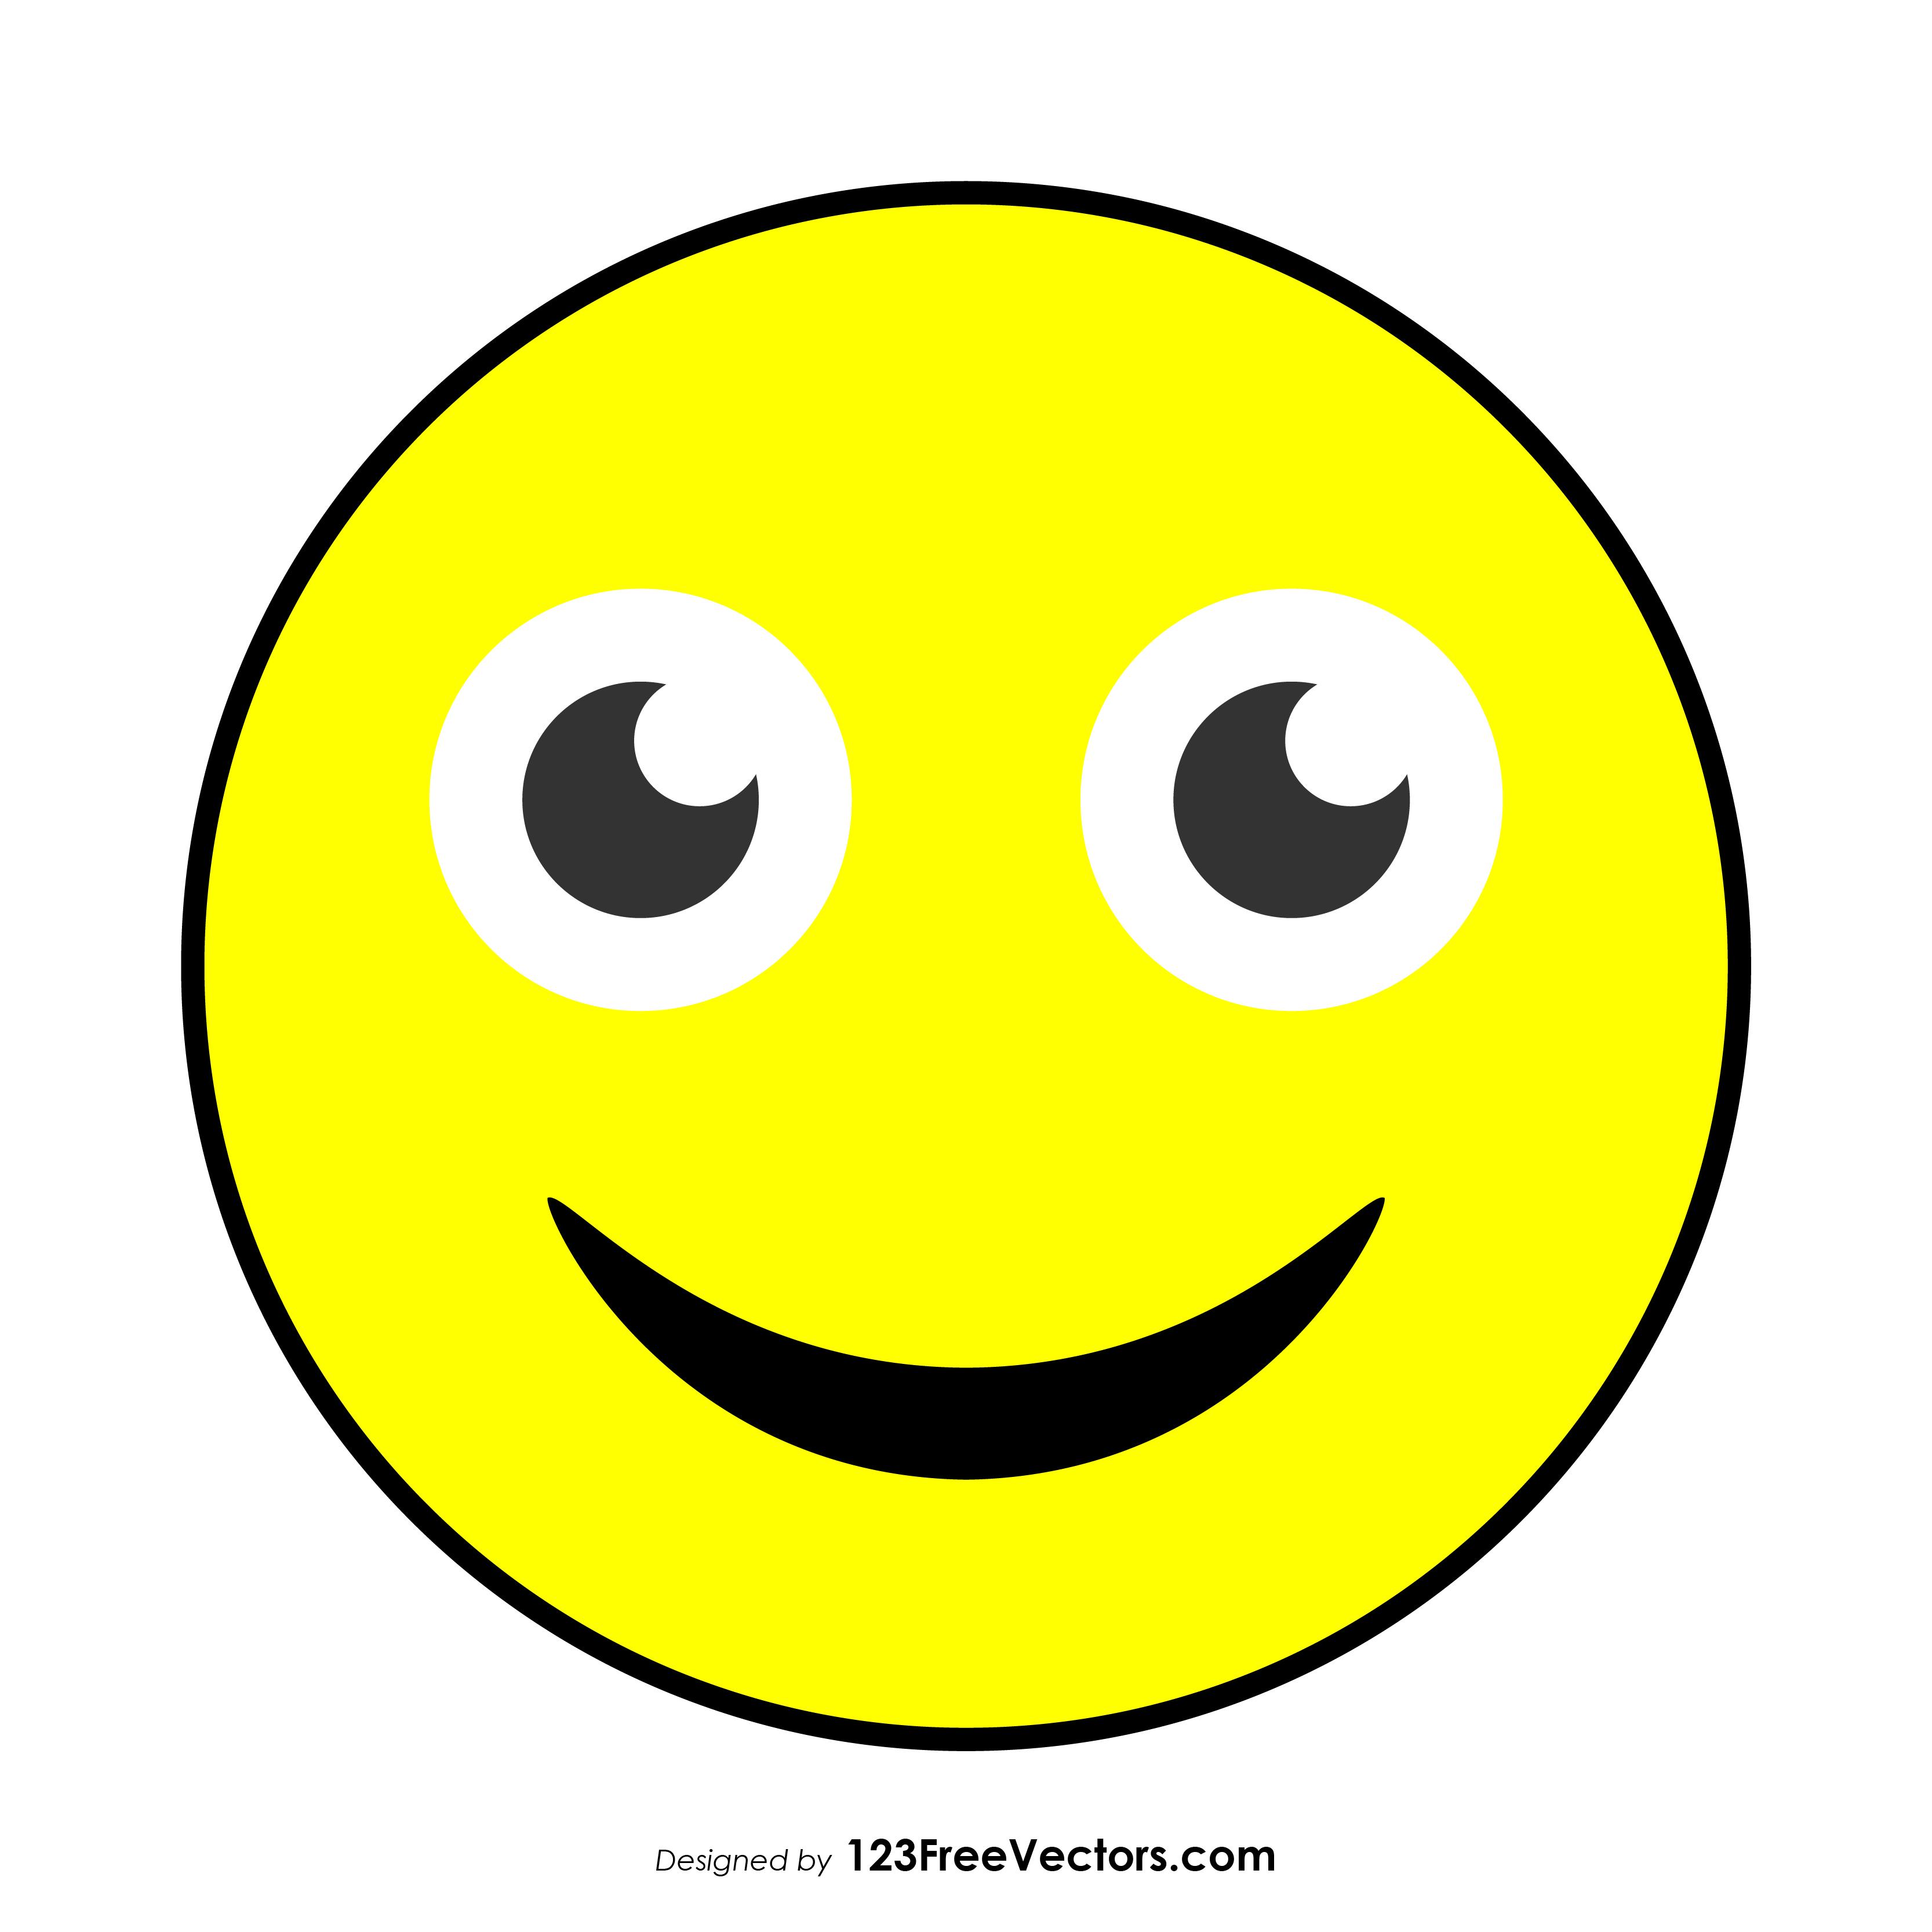 Laughing Emoji Vector at GetDrawings com | Free for personal